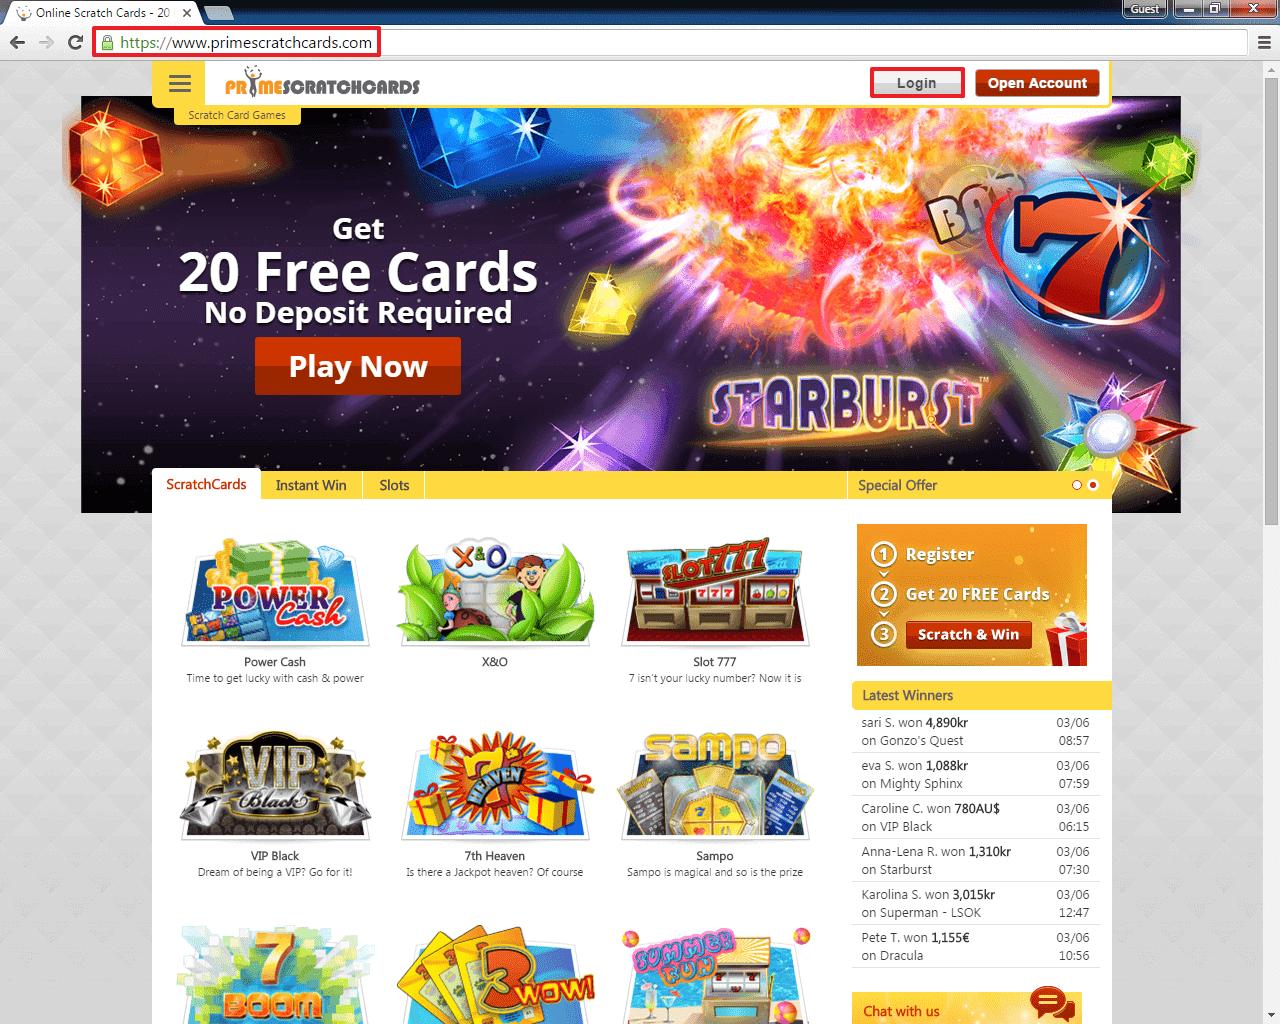 Is prime scratch cards legit codes